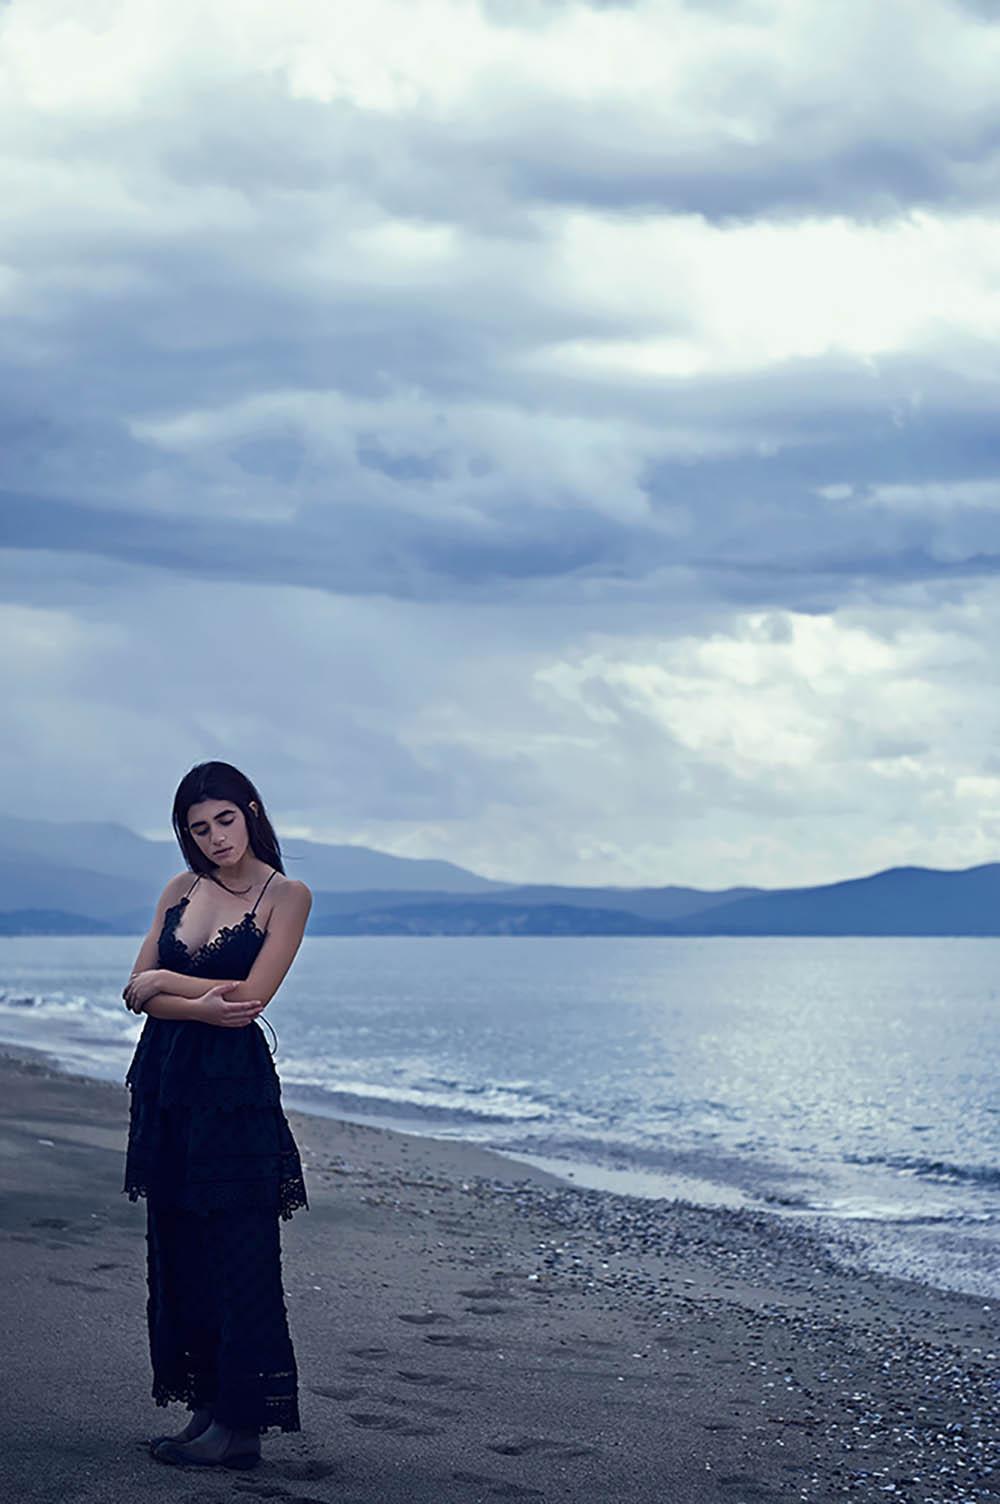 salerno, paestum, lido delle sirene, mare, sea, ocean, portrait, photo shoot, destination photography, ursula schmitz, beauty, italian beauty, dream photo shoot, amalfi, coast, italy,